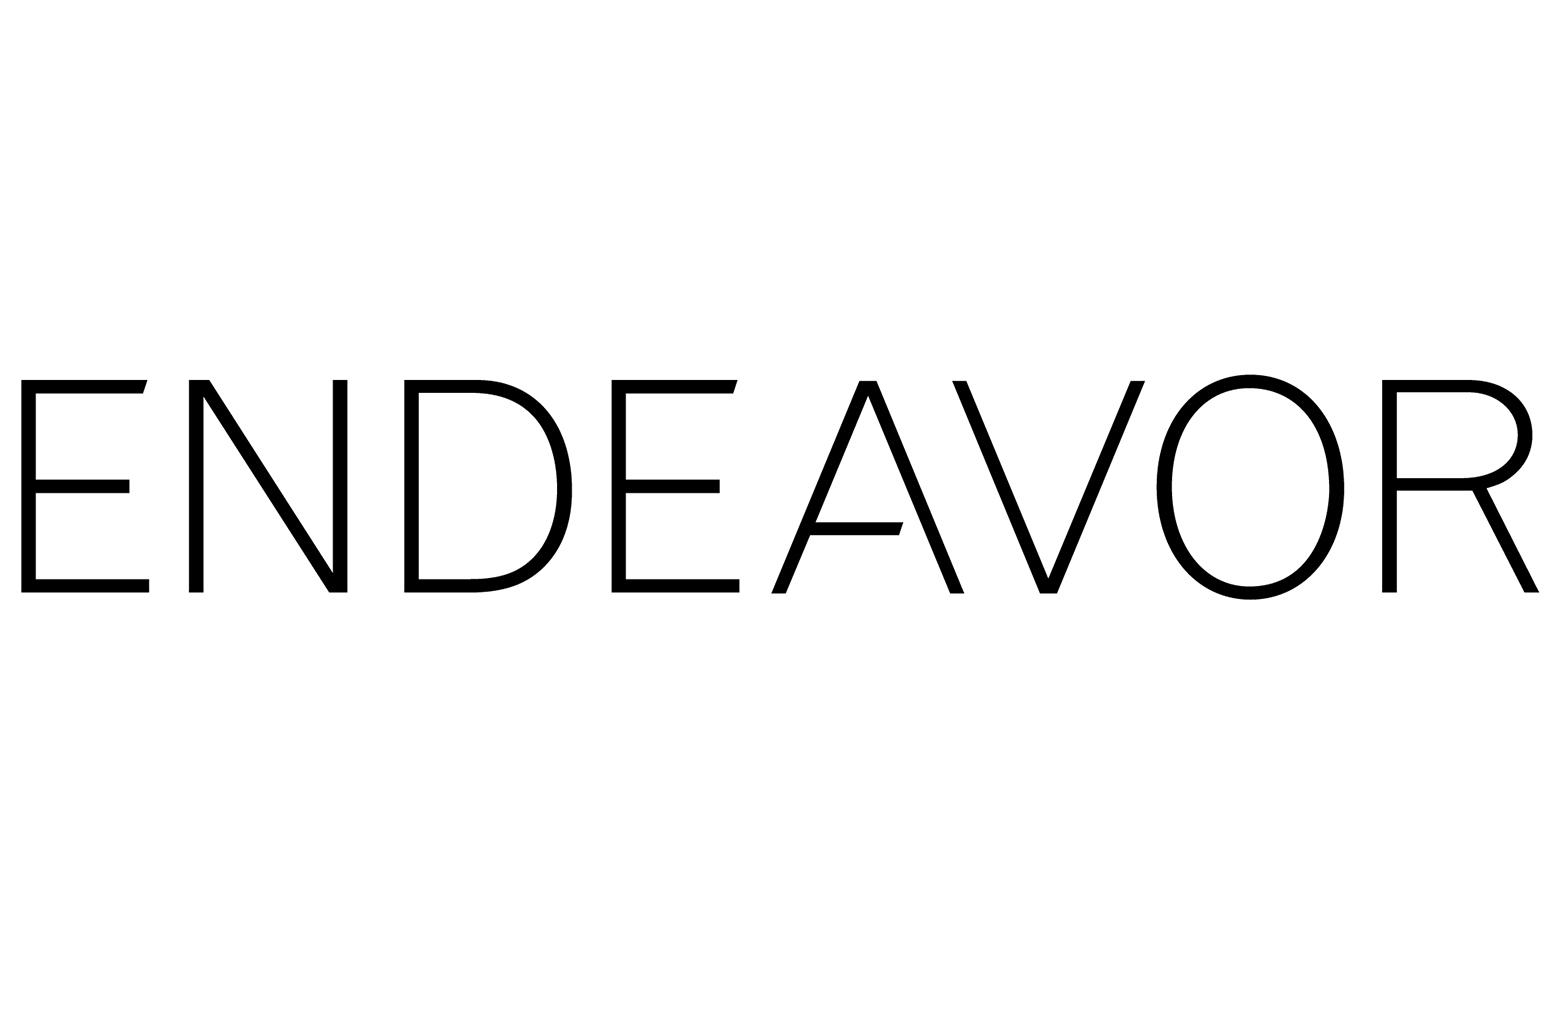 endeavor-logo-2017-billboard-1548.jpg